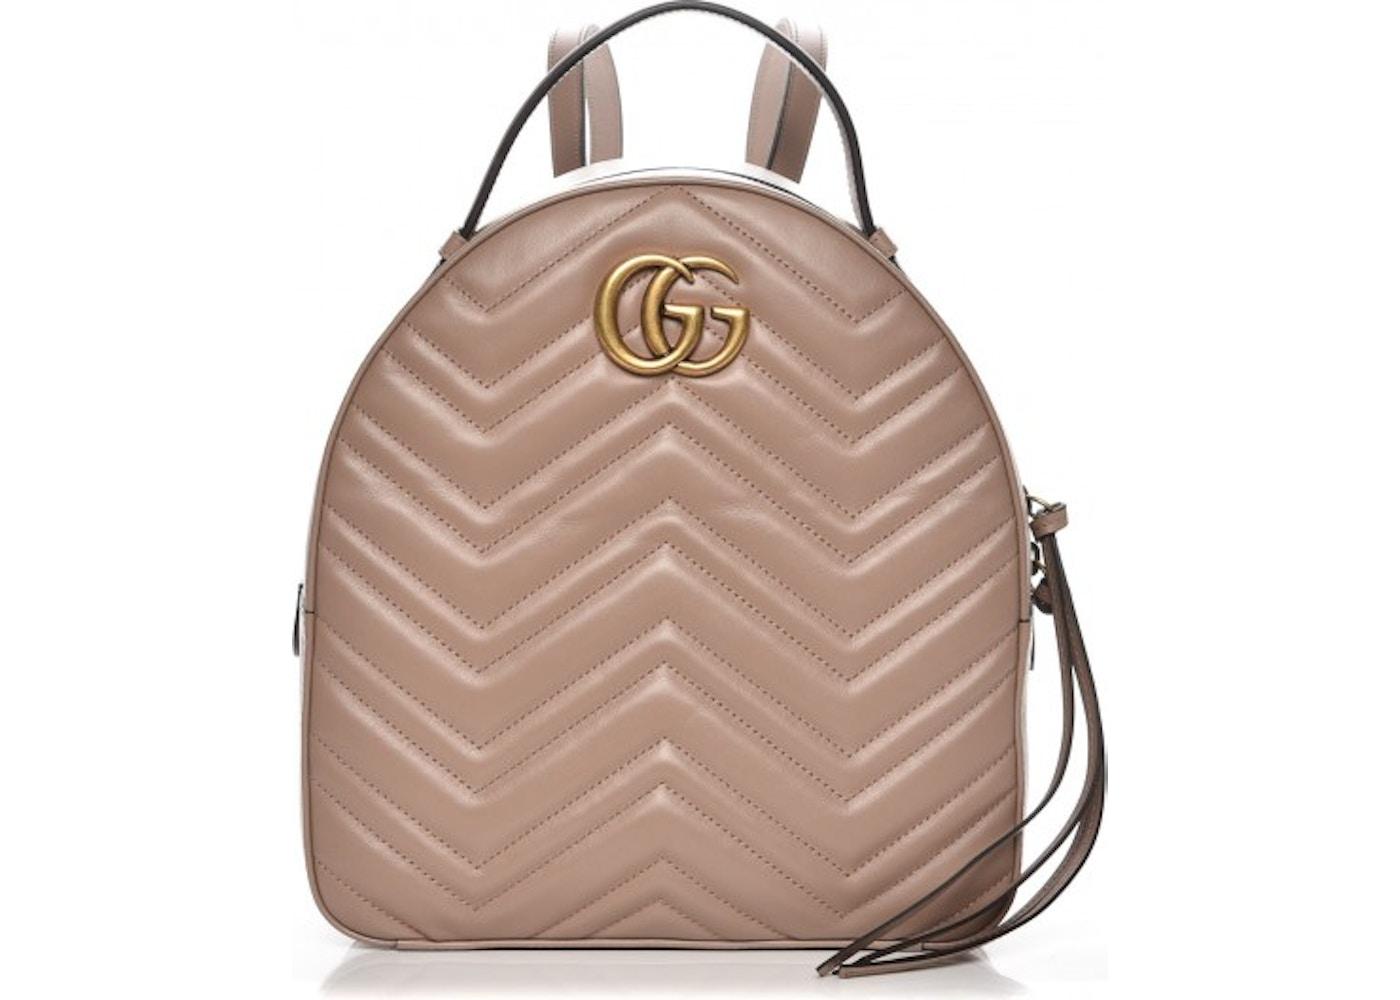 701c6f6bf Gucci Marmont Backpack Matelasse GG Interlocking Porcelain Rose